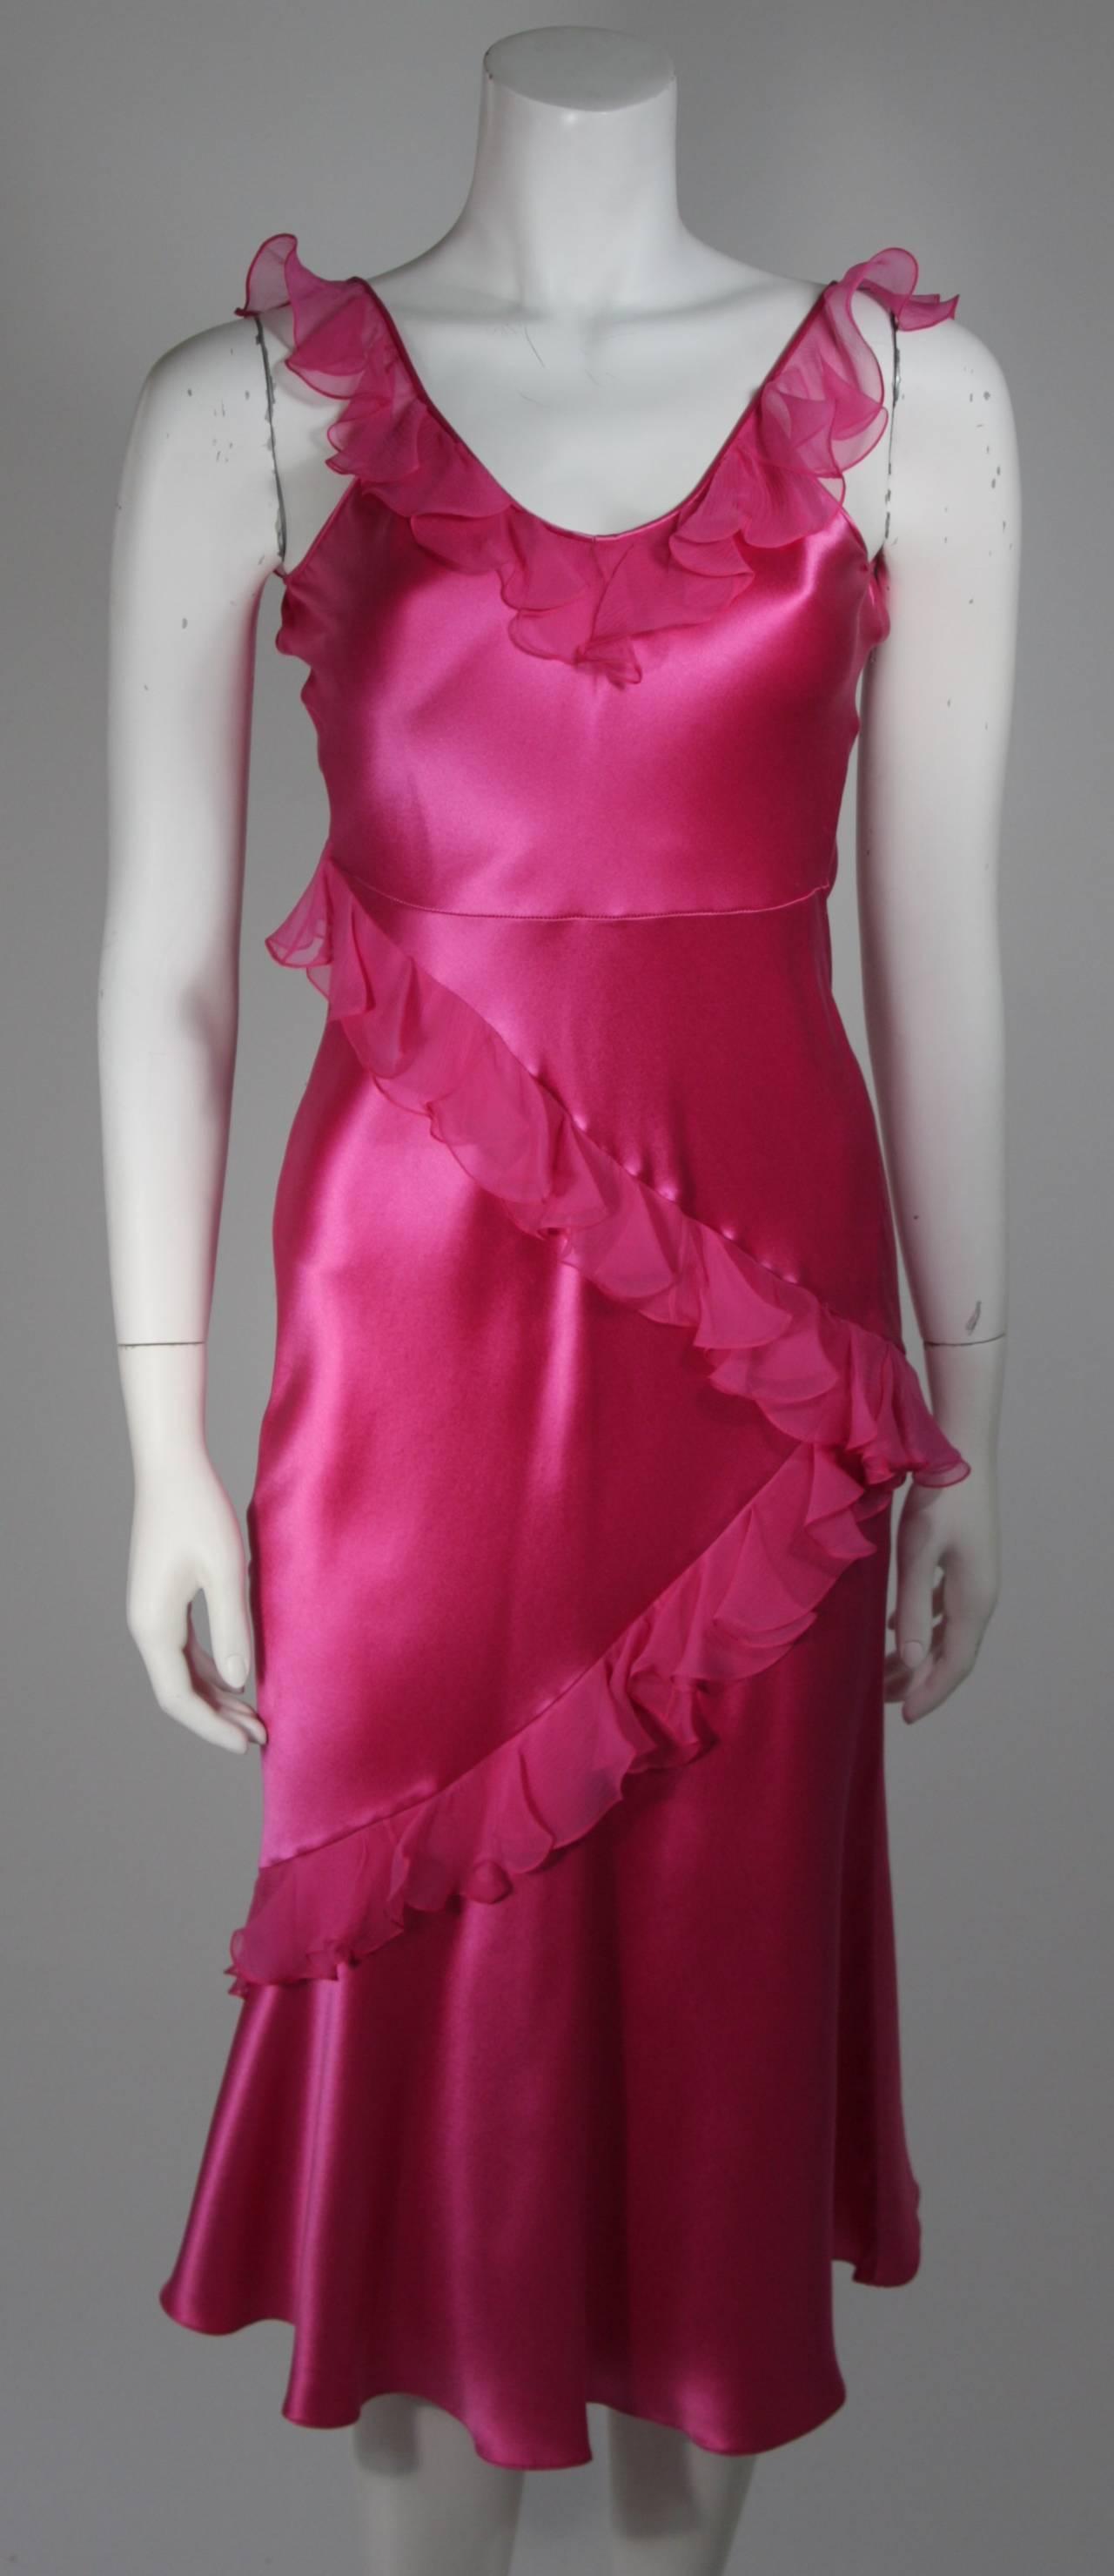 Christina Dior Ruffled Pink Silk Chiffon Dress Size XS For Sale 1